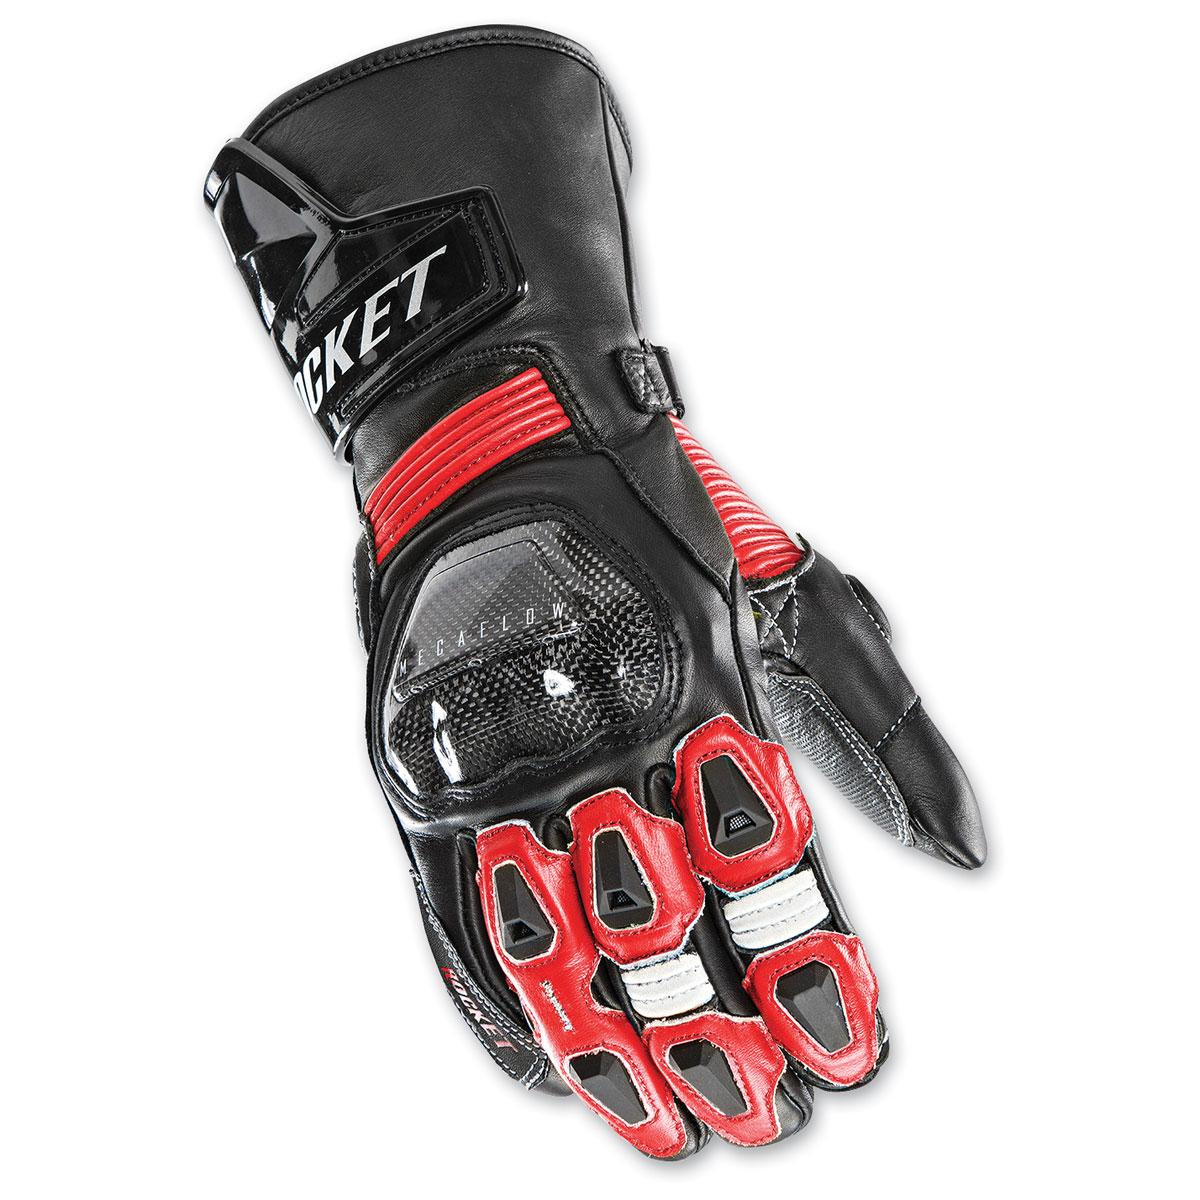 Joe Rocket Men's GPX Black/Red Gloves